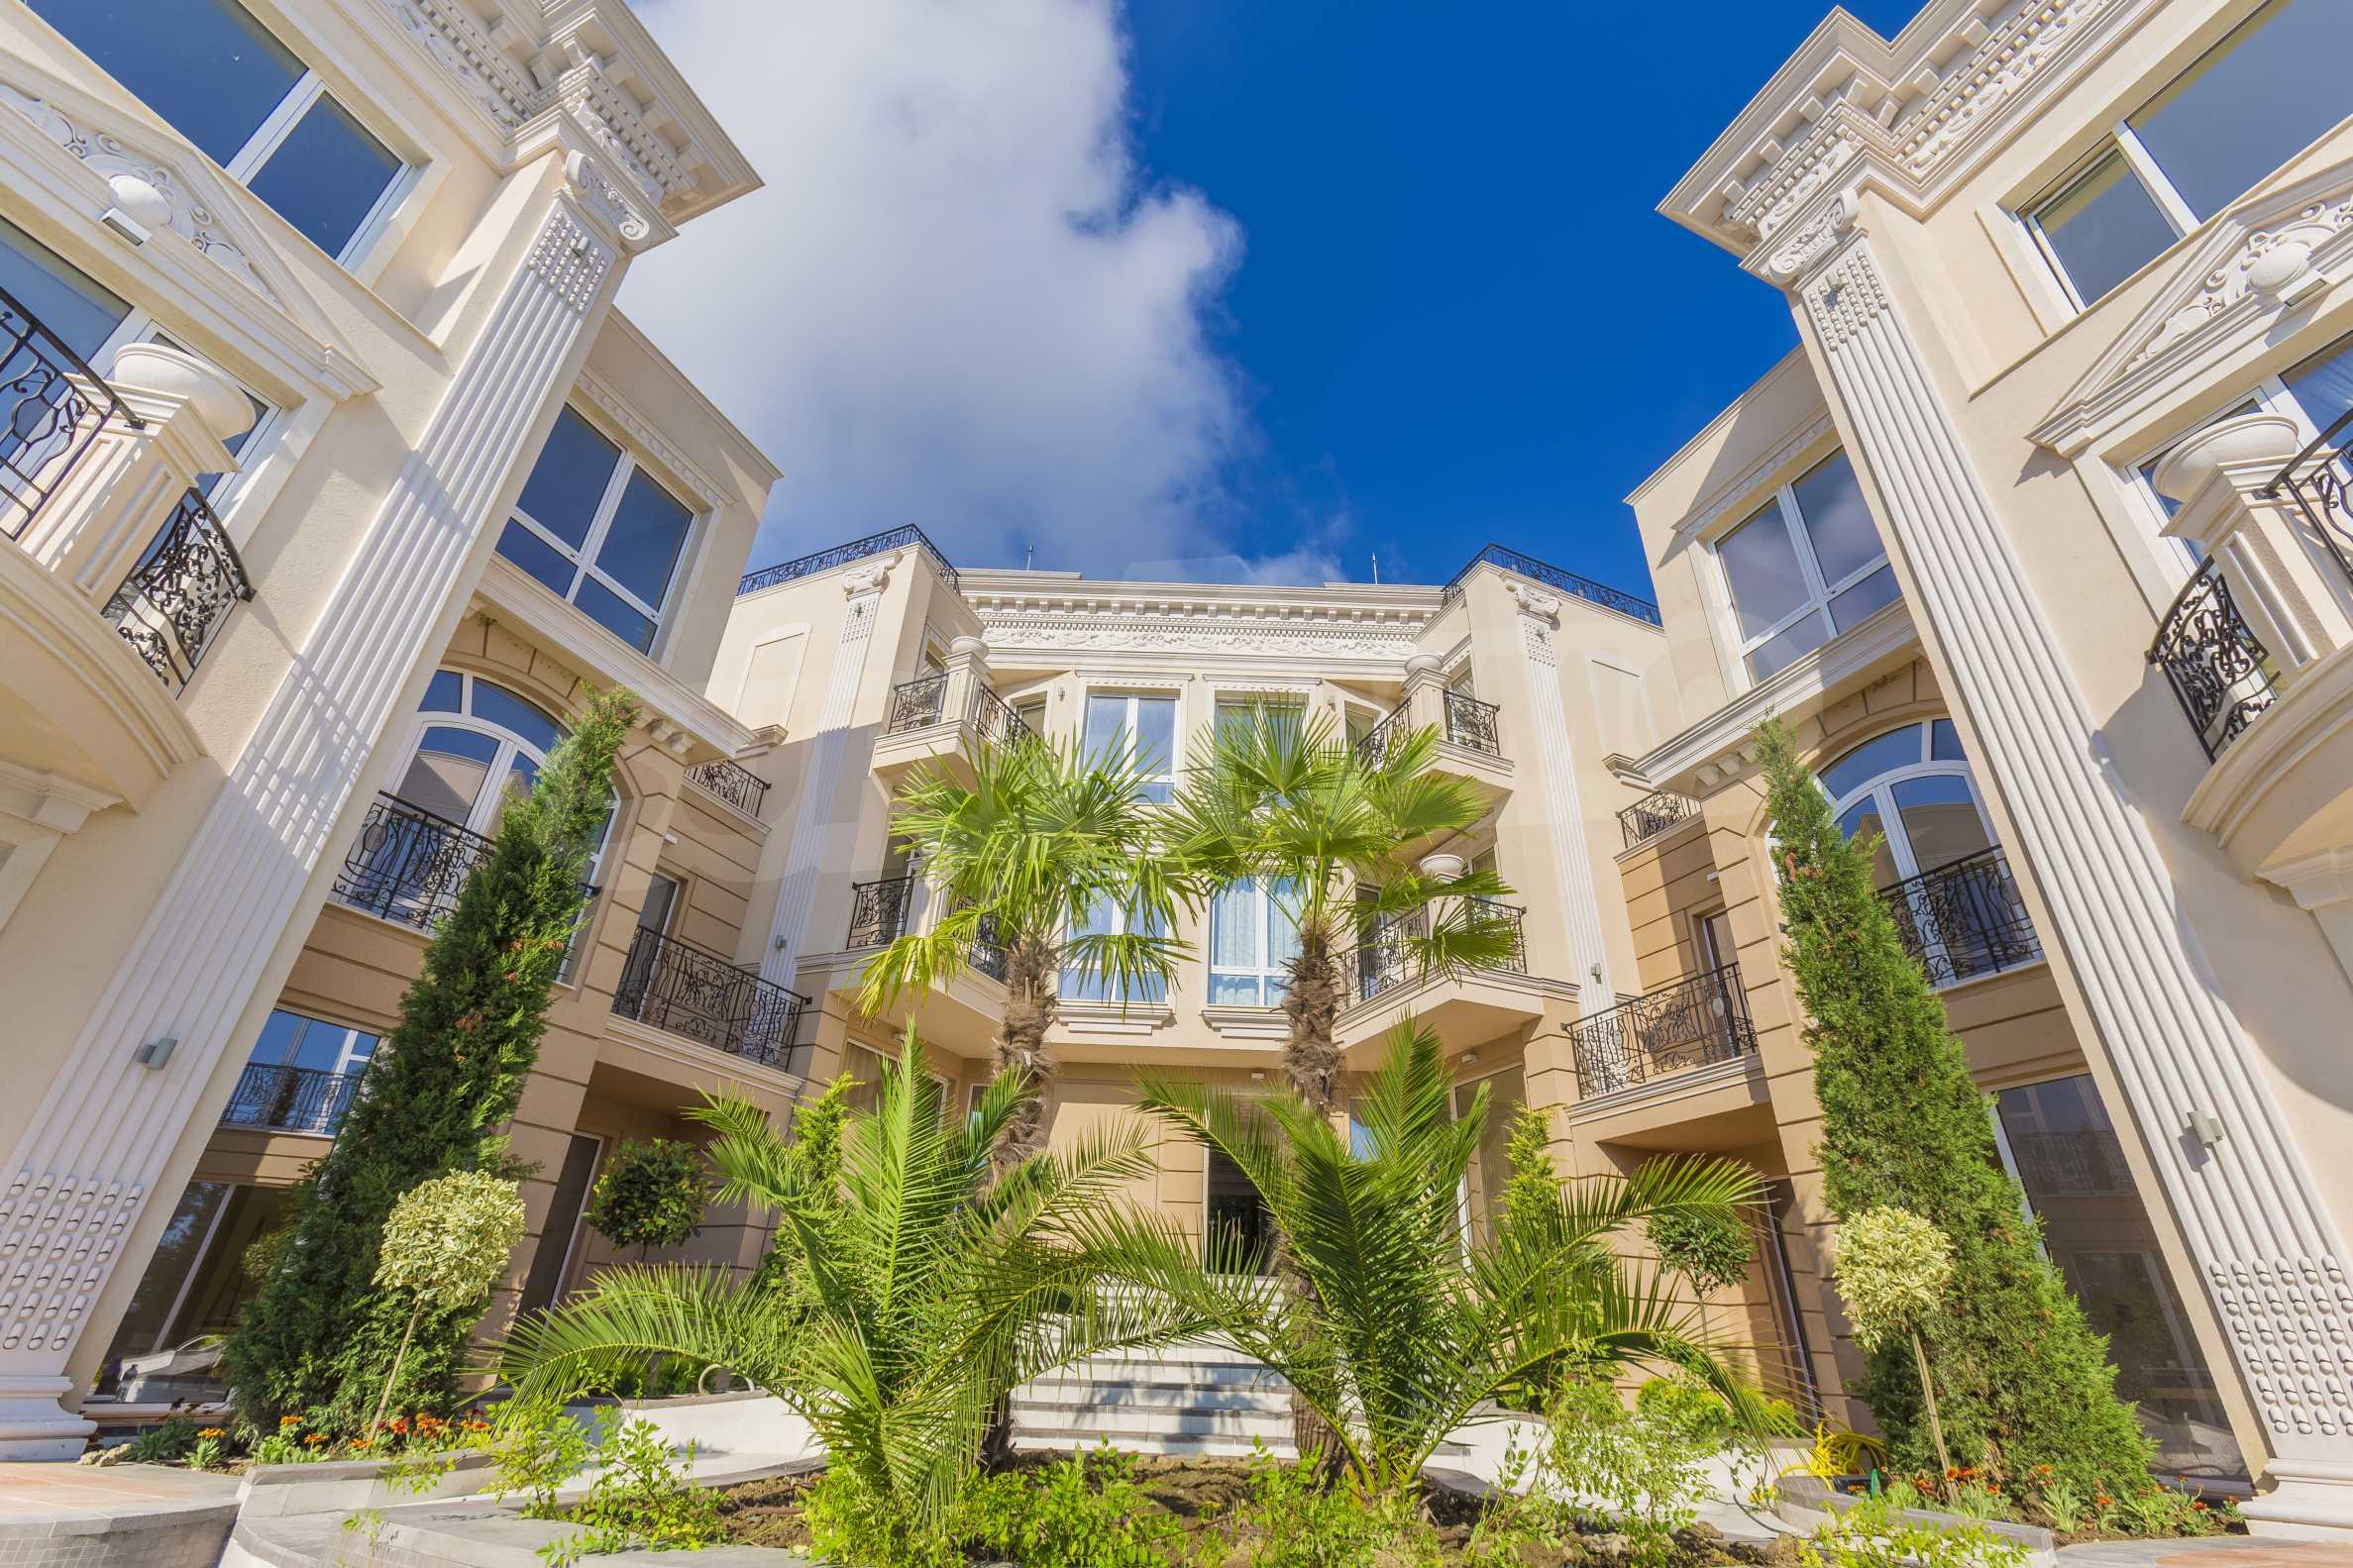 Exclusive 2-bedroom beachfront apartment in the prestigious Belle Époque Beach Residence 42